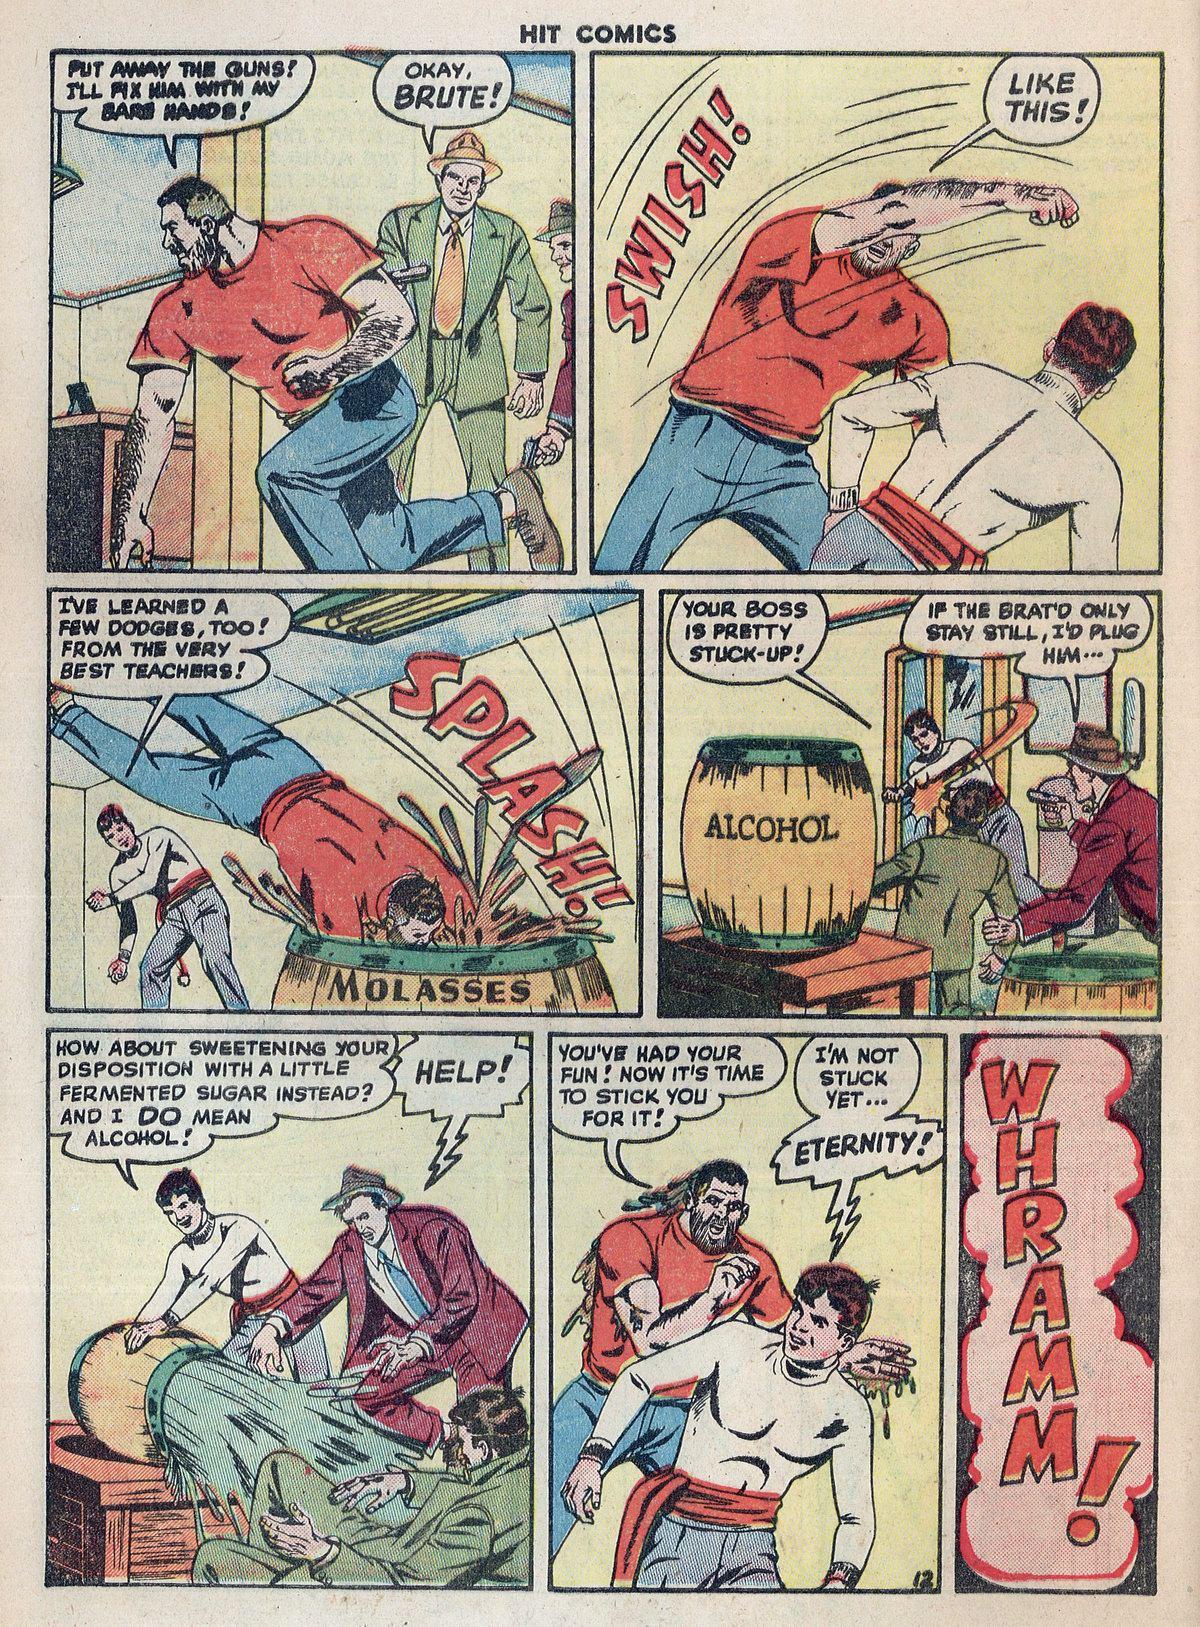 Read online Hit Comics comic -  Issue #55 - 14